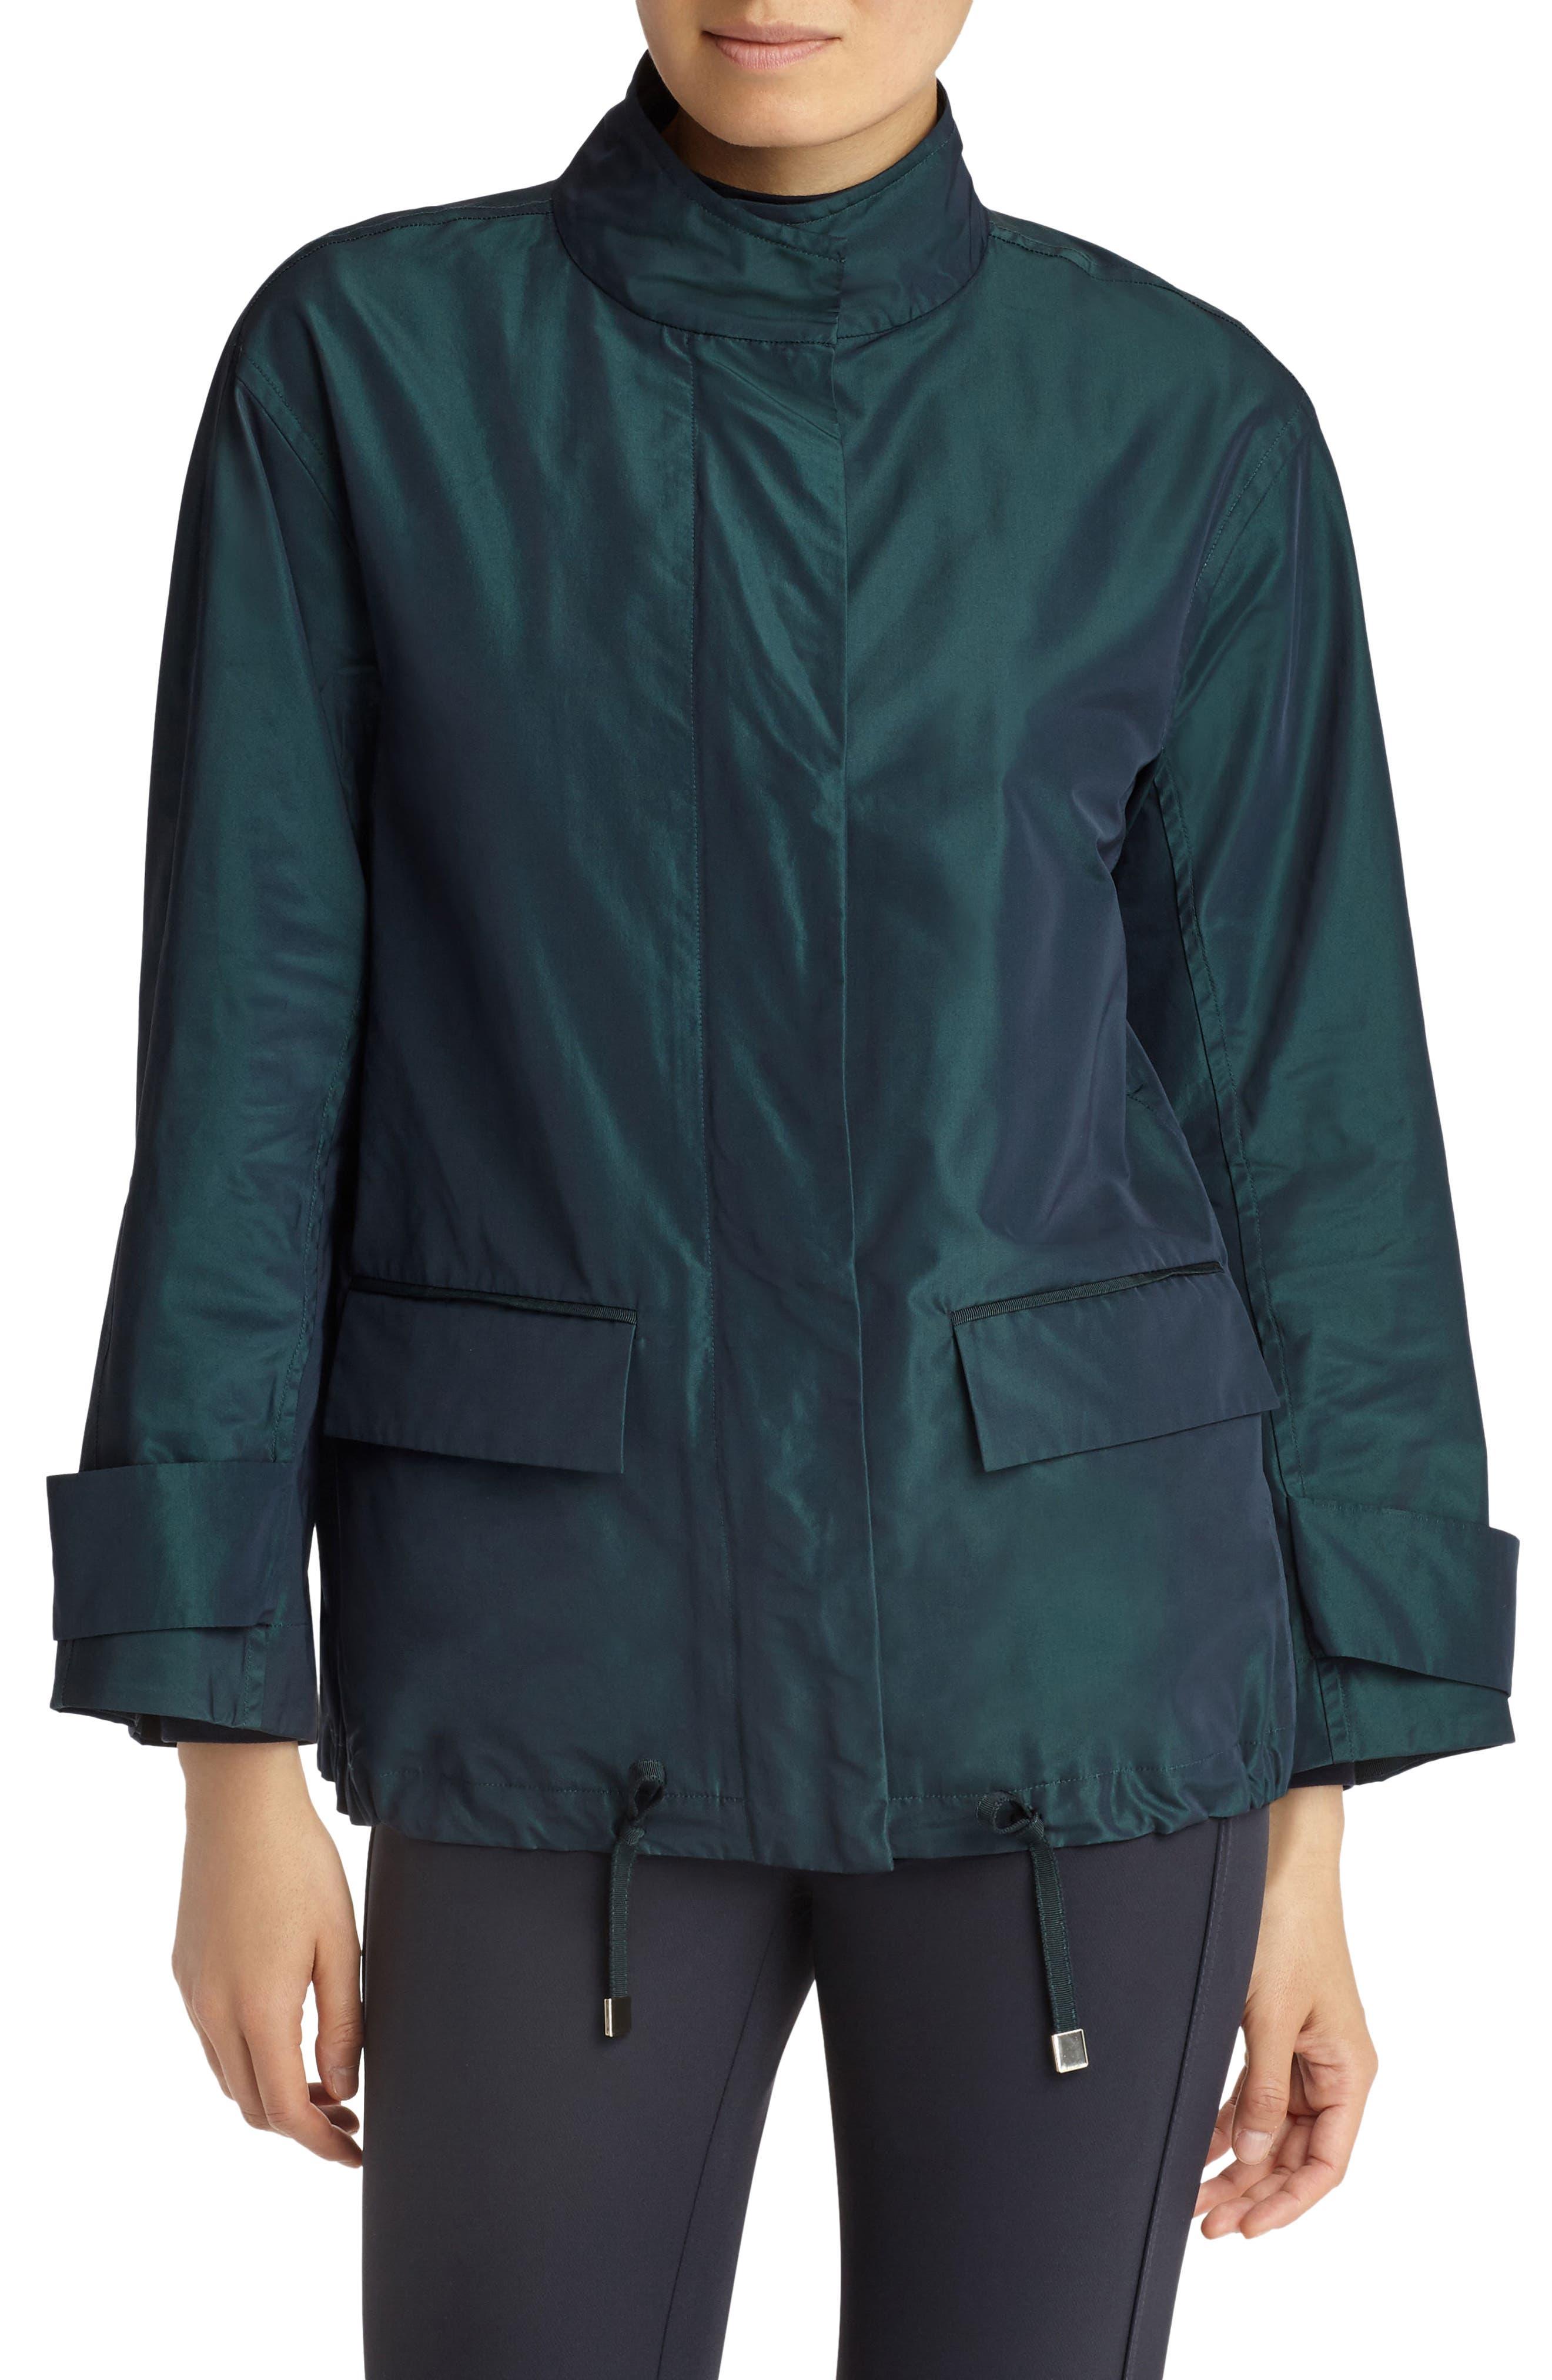 Markus Empirical Tech Cloth Jacket,                             Main thumbnail 1, color,